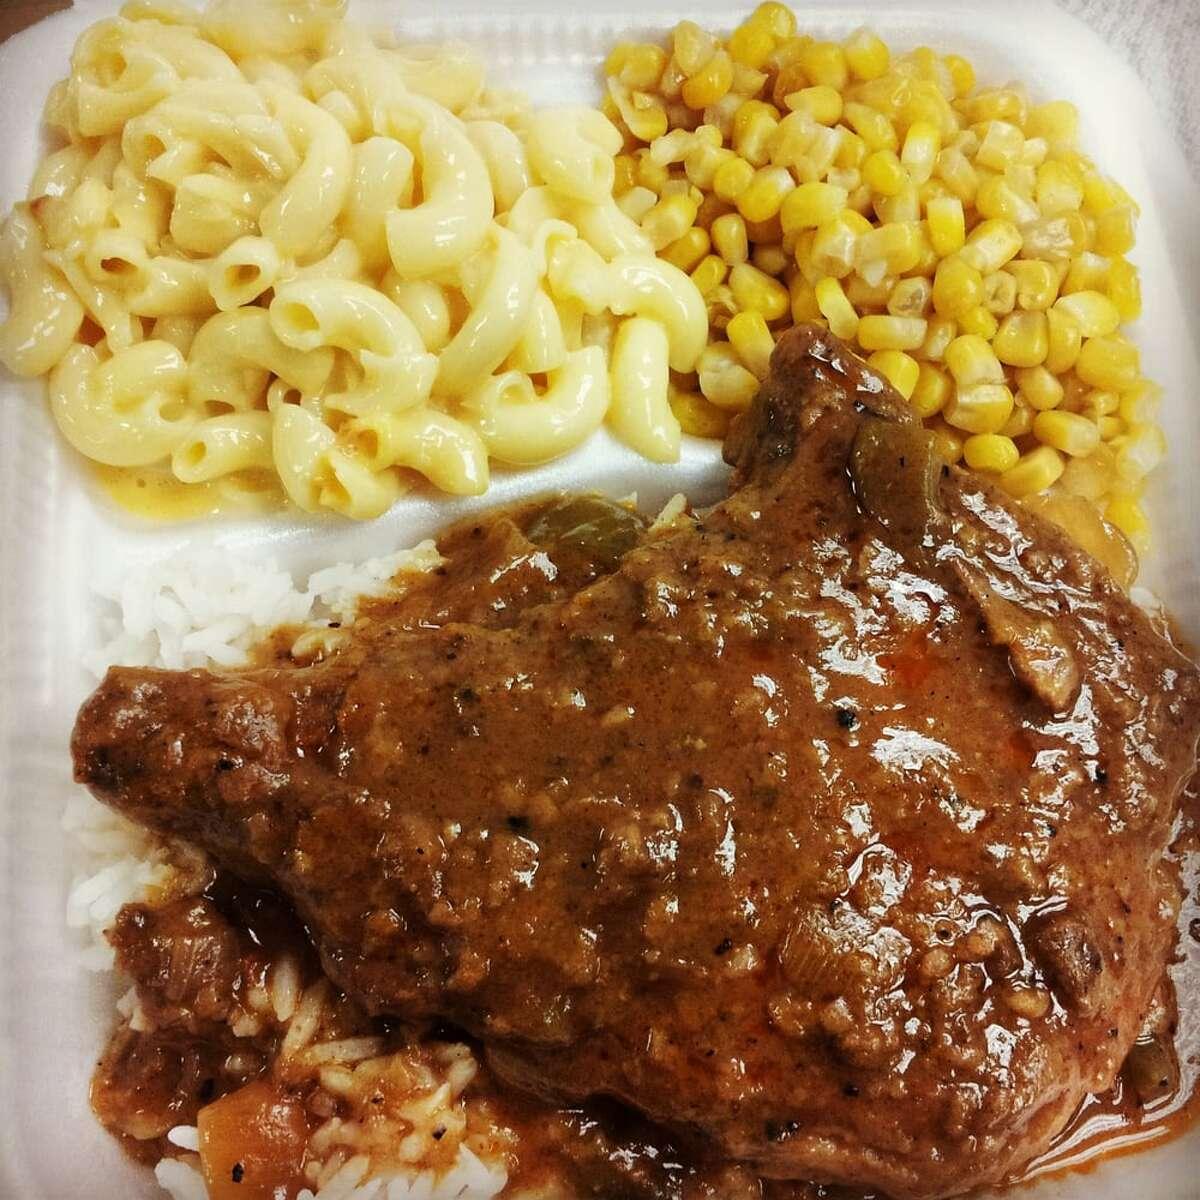 Houston's Finest Soulfood on WheelsFind it here, MeyerlandMenu: Oxtail, fried shrimp, smothered pork chops.Photo: Yelp/Kellie Y